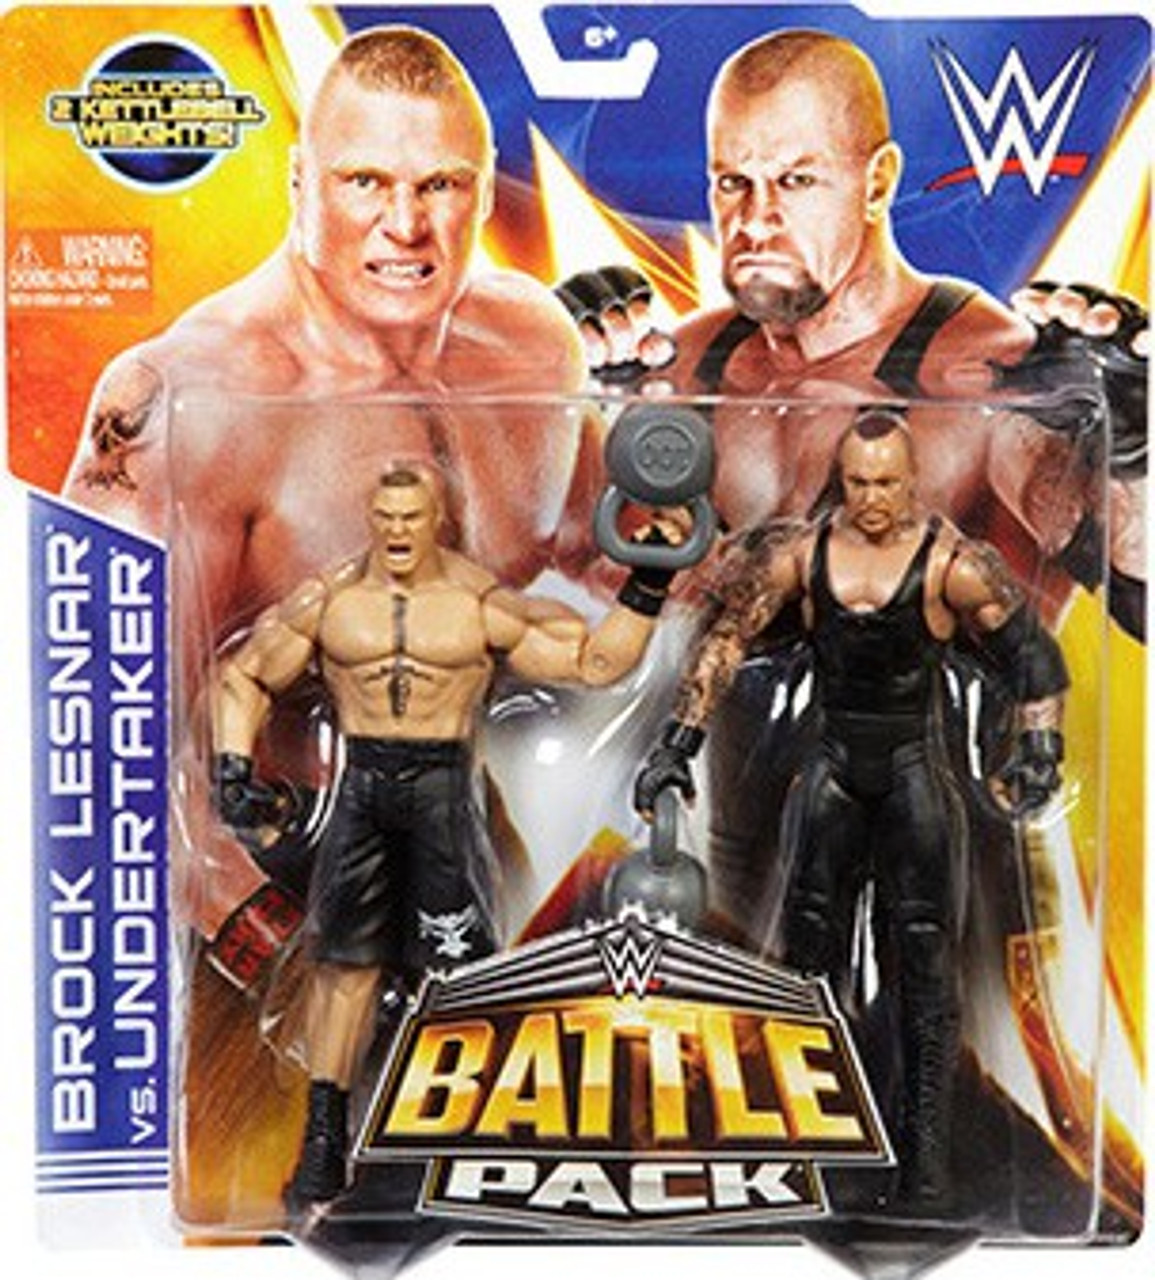 WWE Wrestling Series 30 Brock Lesnar & Undertaker Action Figure 2-Pack [Kettlebell Weights]